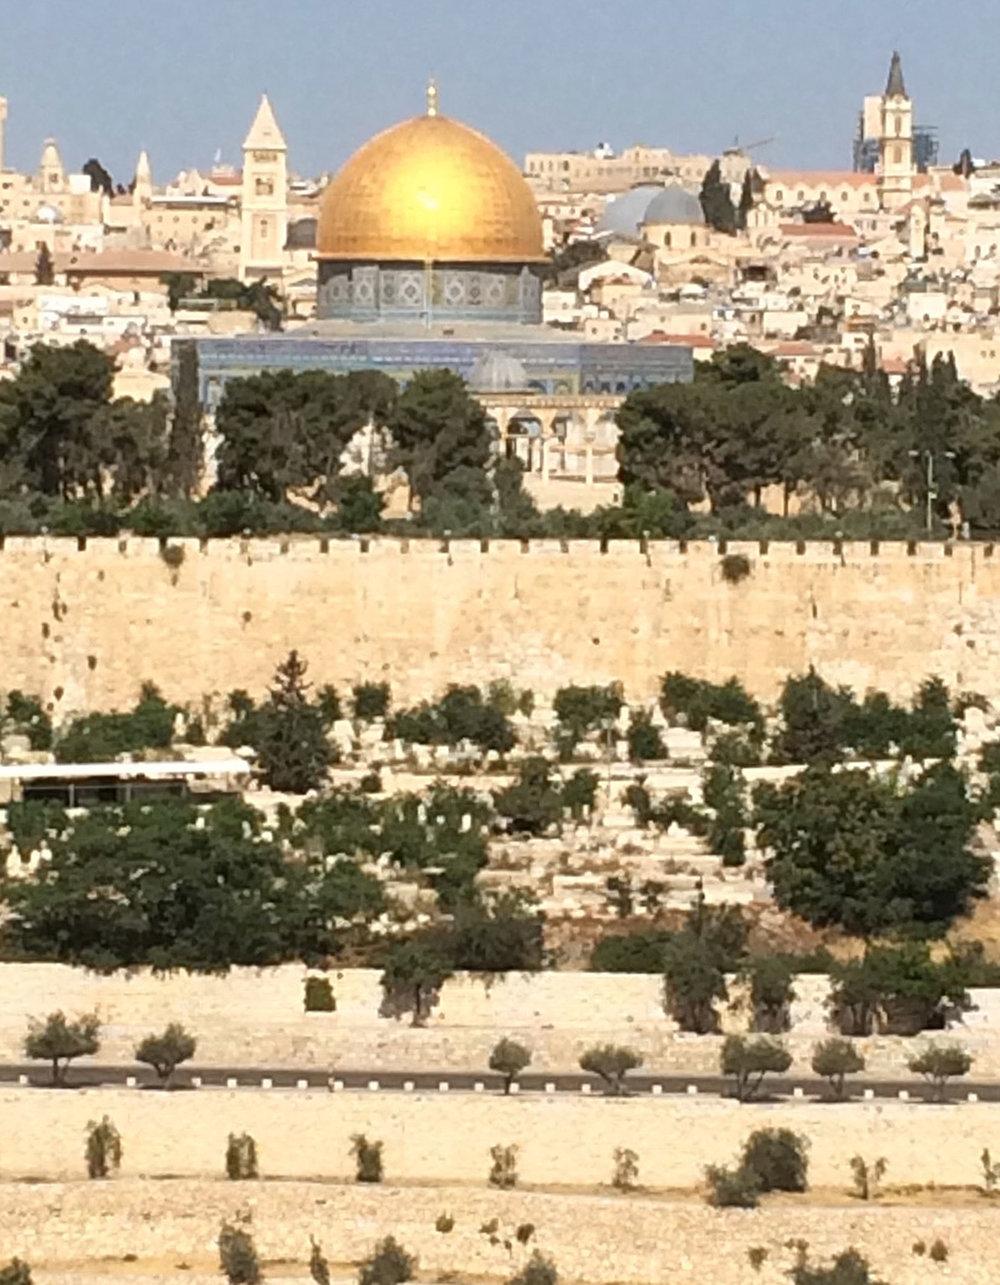 Dome of the Rock shrine, Jerusalem